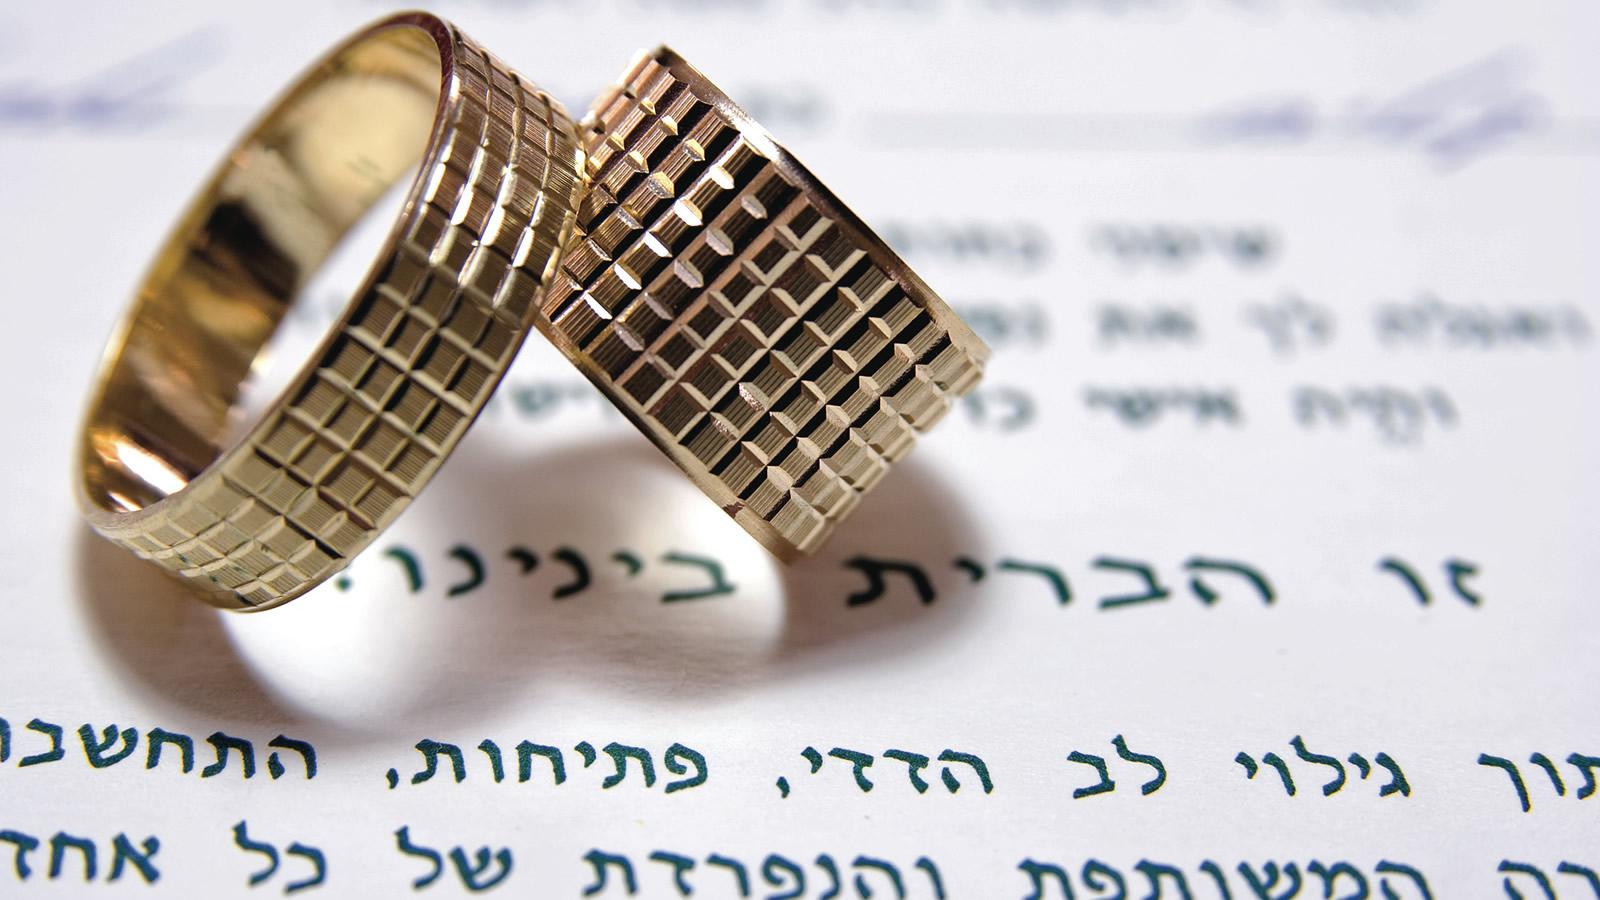 Wedding Rings on top of Hebrew Writing